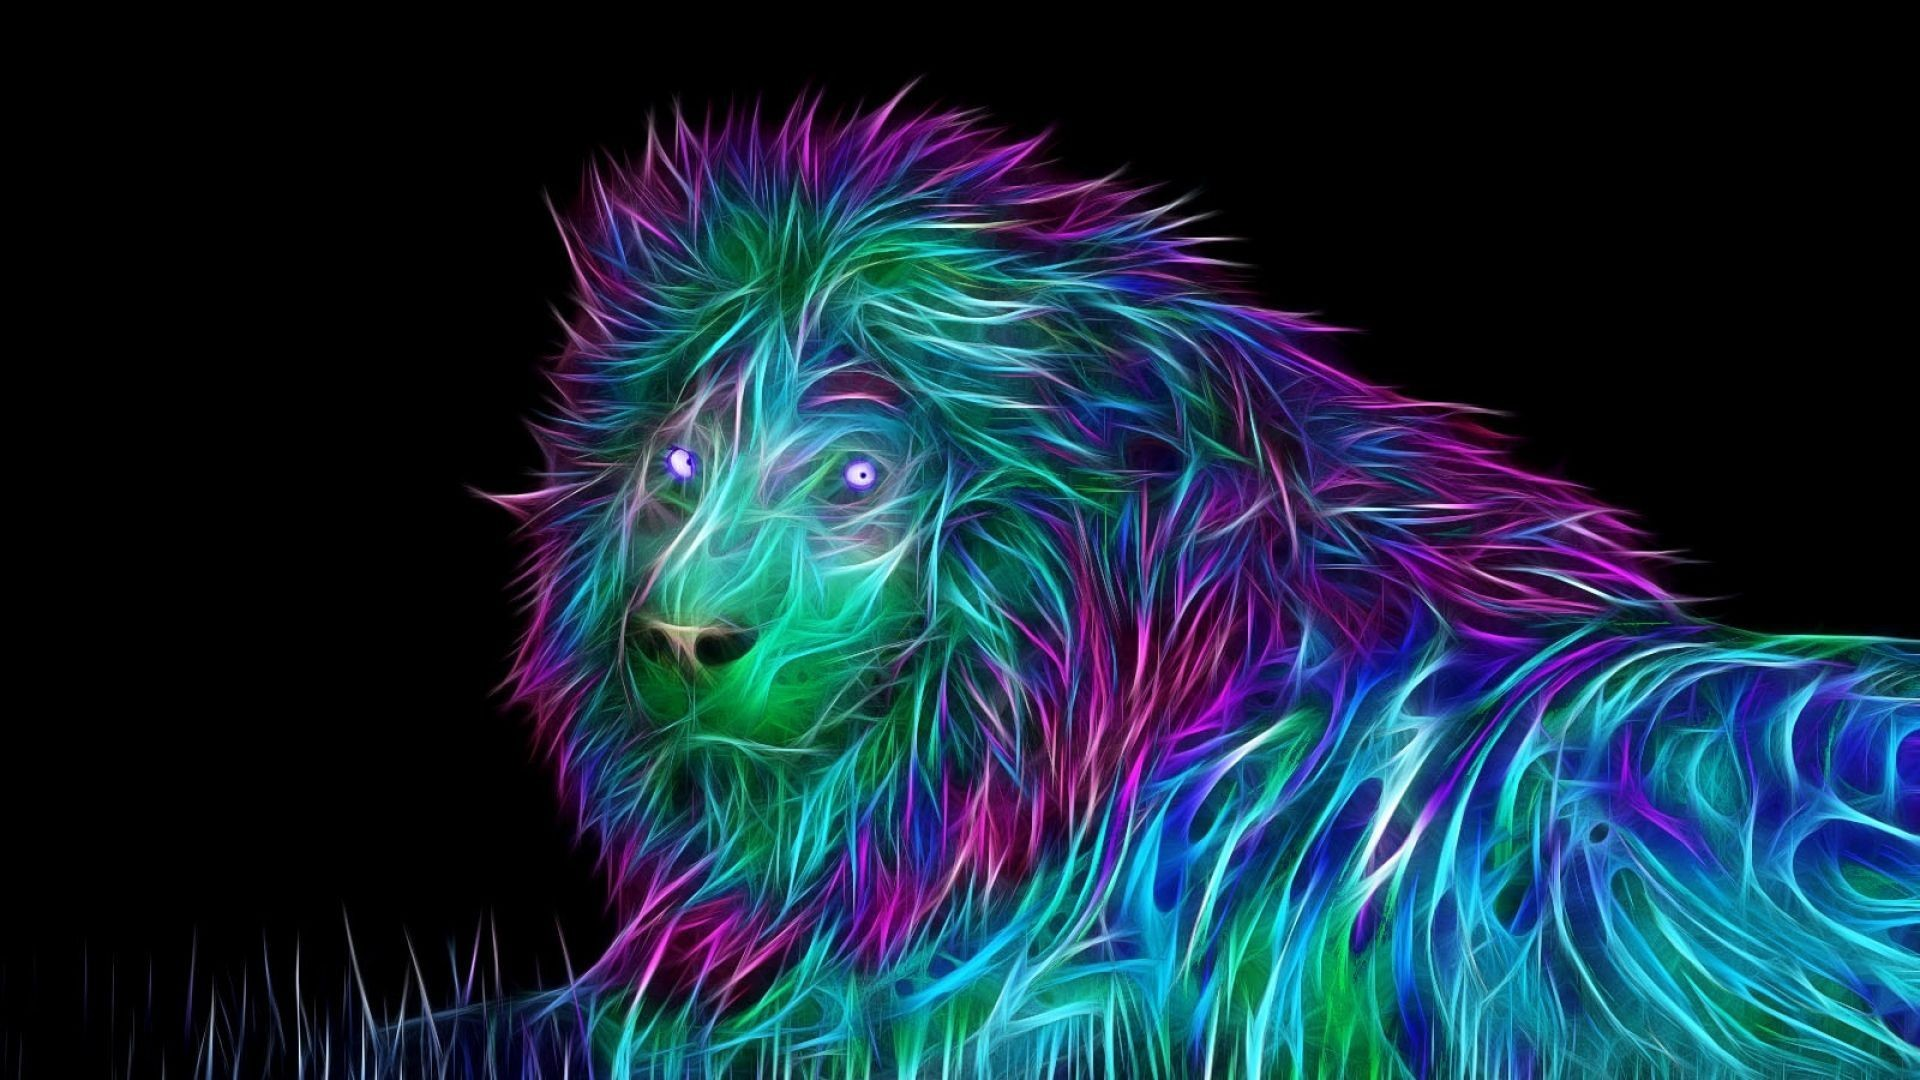 Download Wallpaper Abstract, 3d, Art, Lion Full HD 1080p .